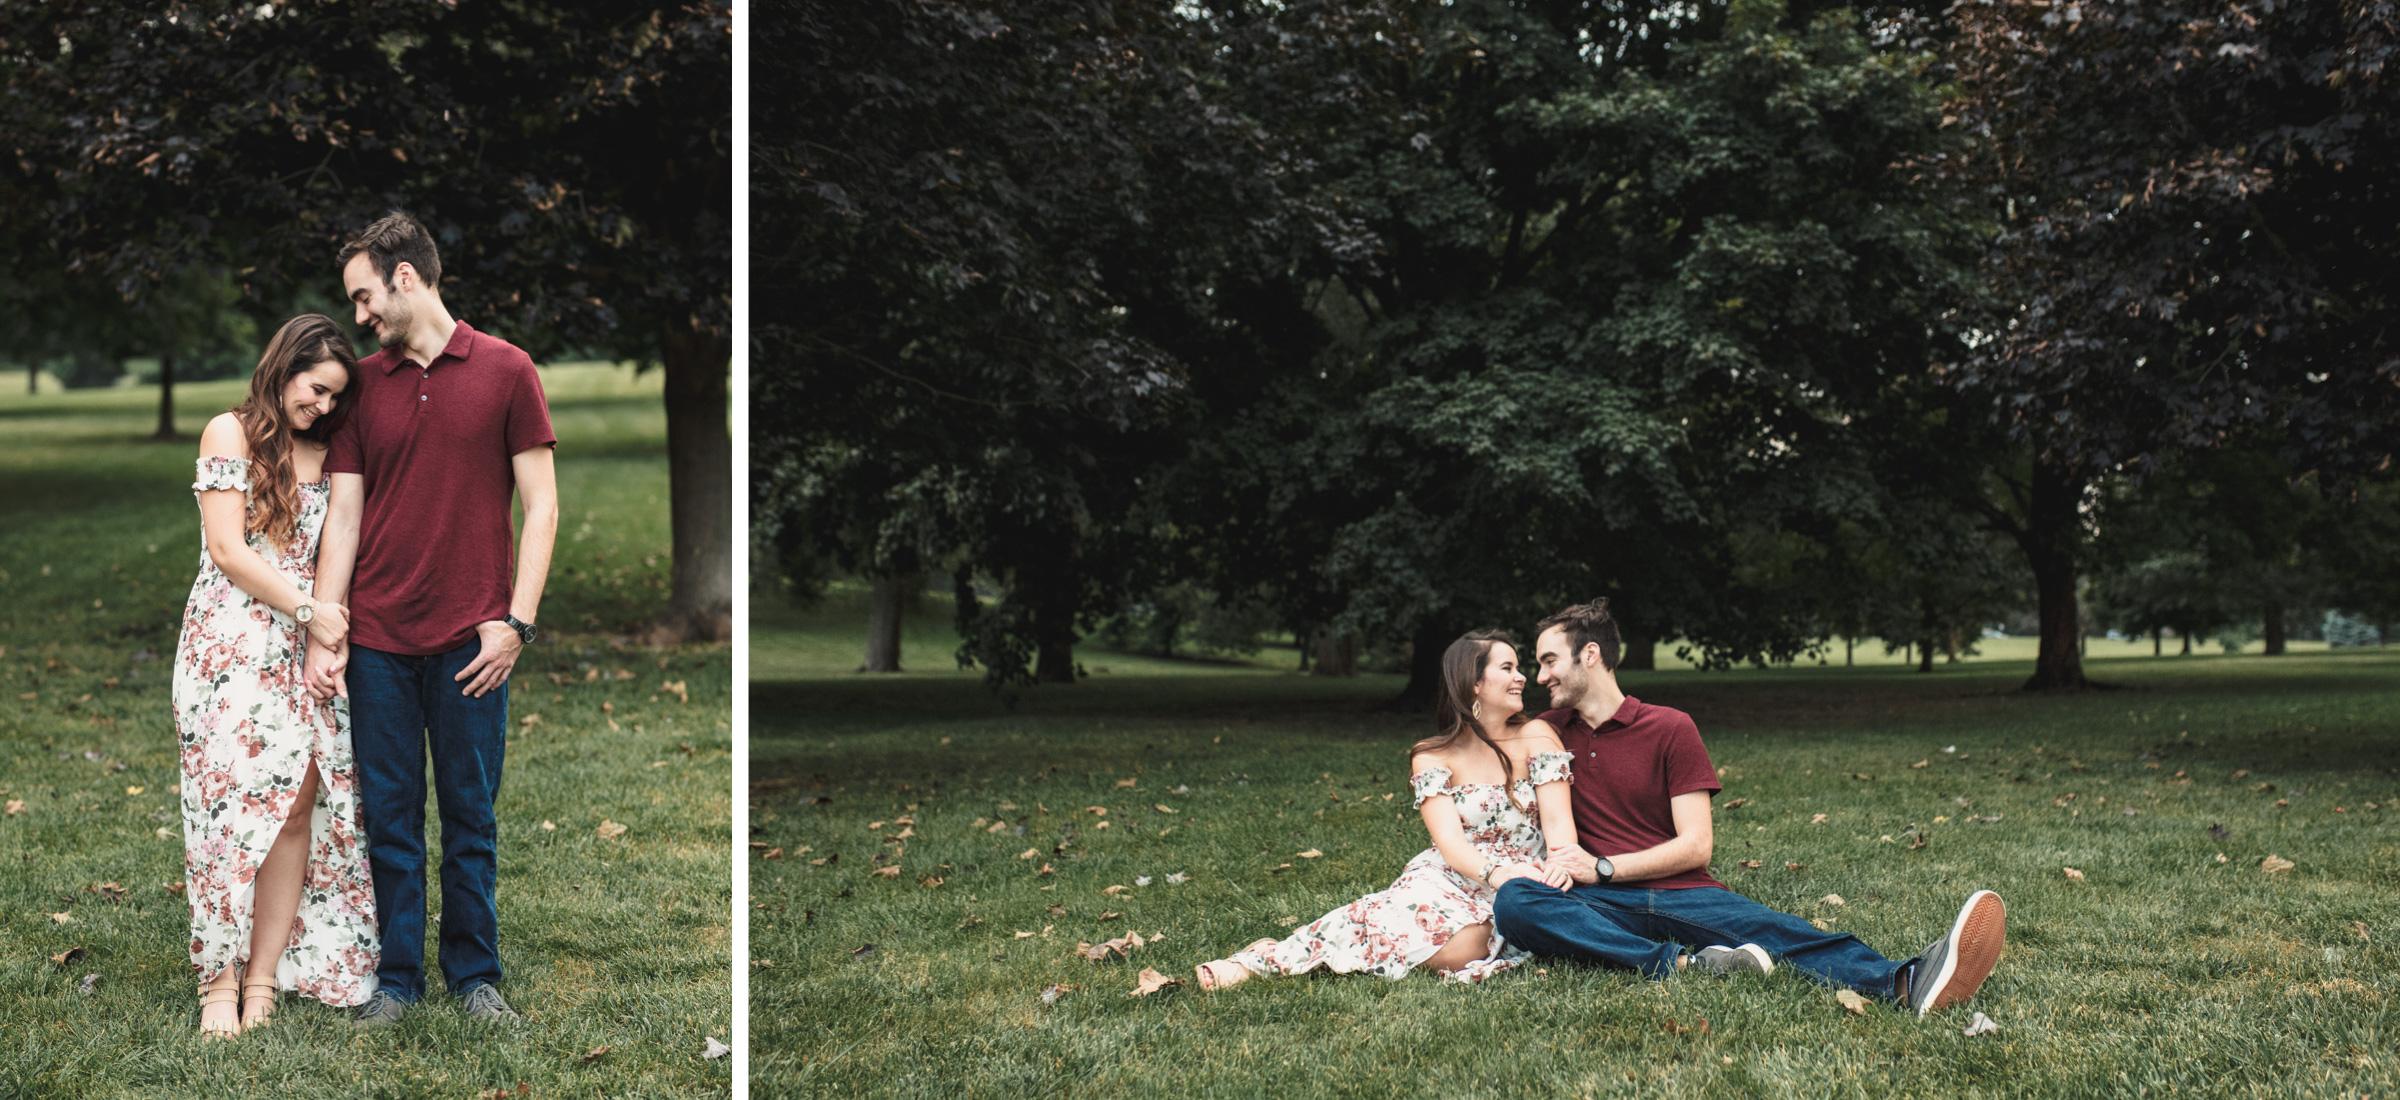 Beginning of Fall_Bliss_Engagement_Kansas_City_Kelsey_Diane_Photography_9.jpg